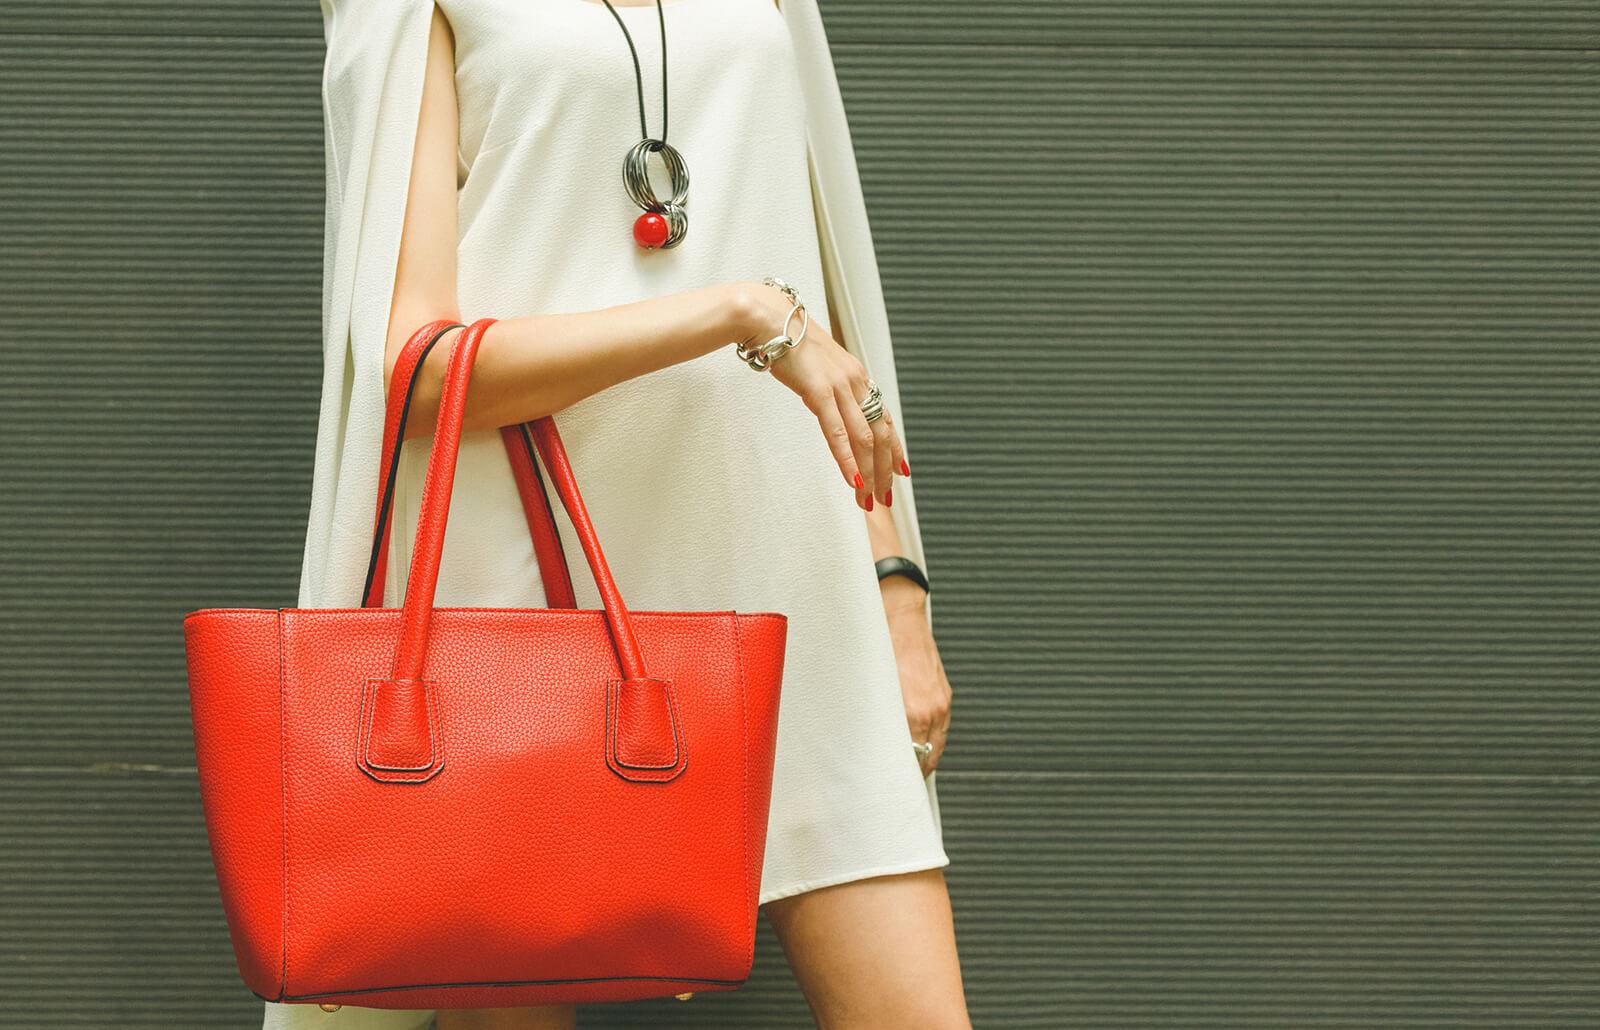 8576b8212adc31 Designer Bag Rental Us